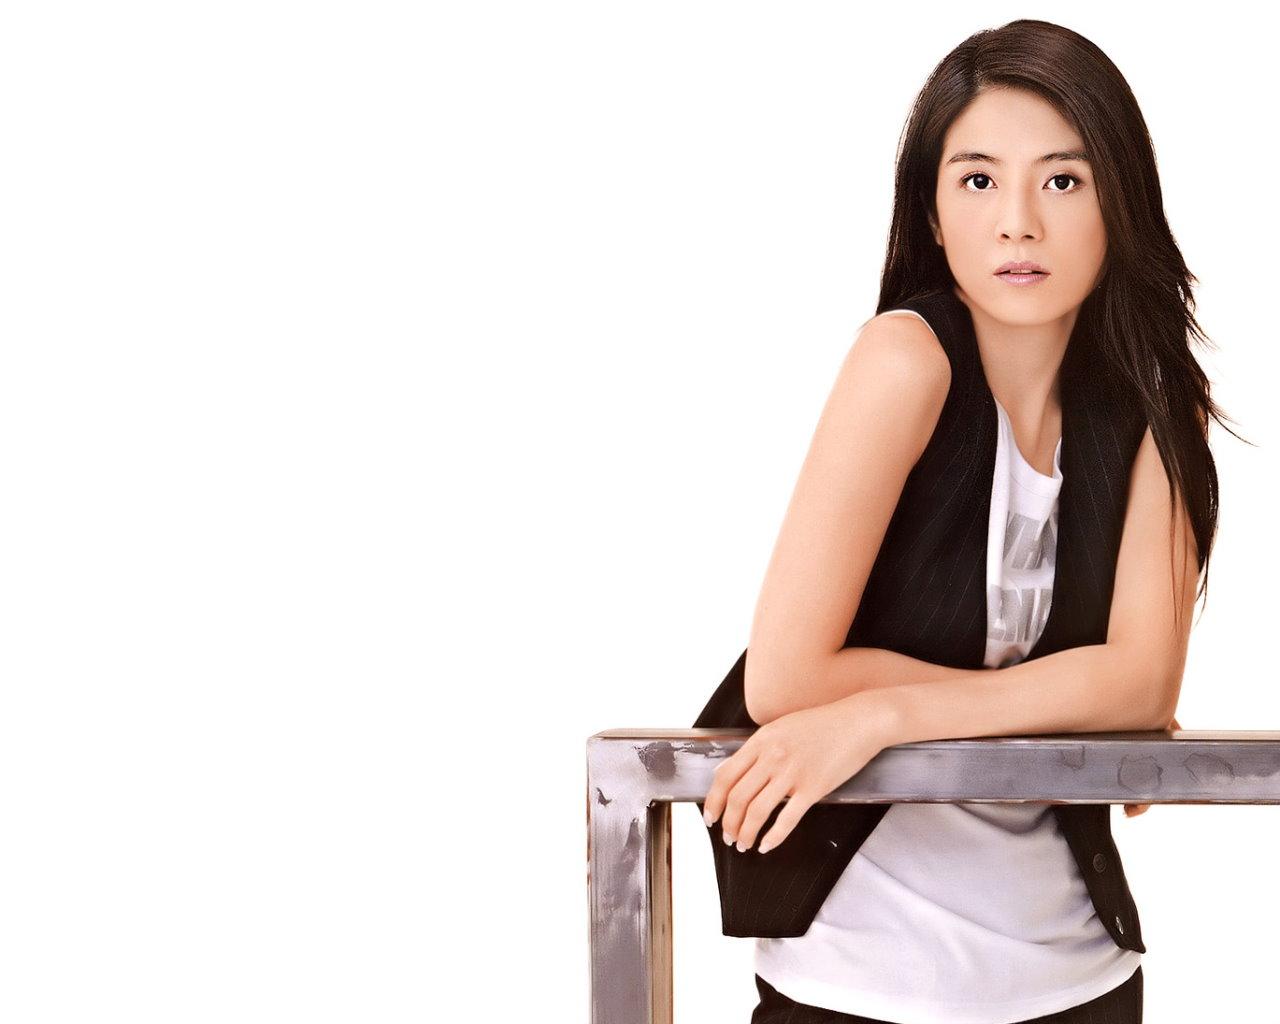 Nude charlie yeung